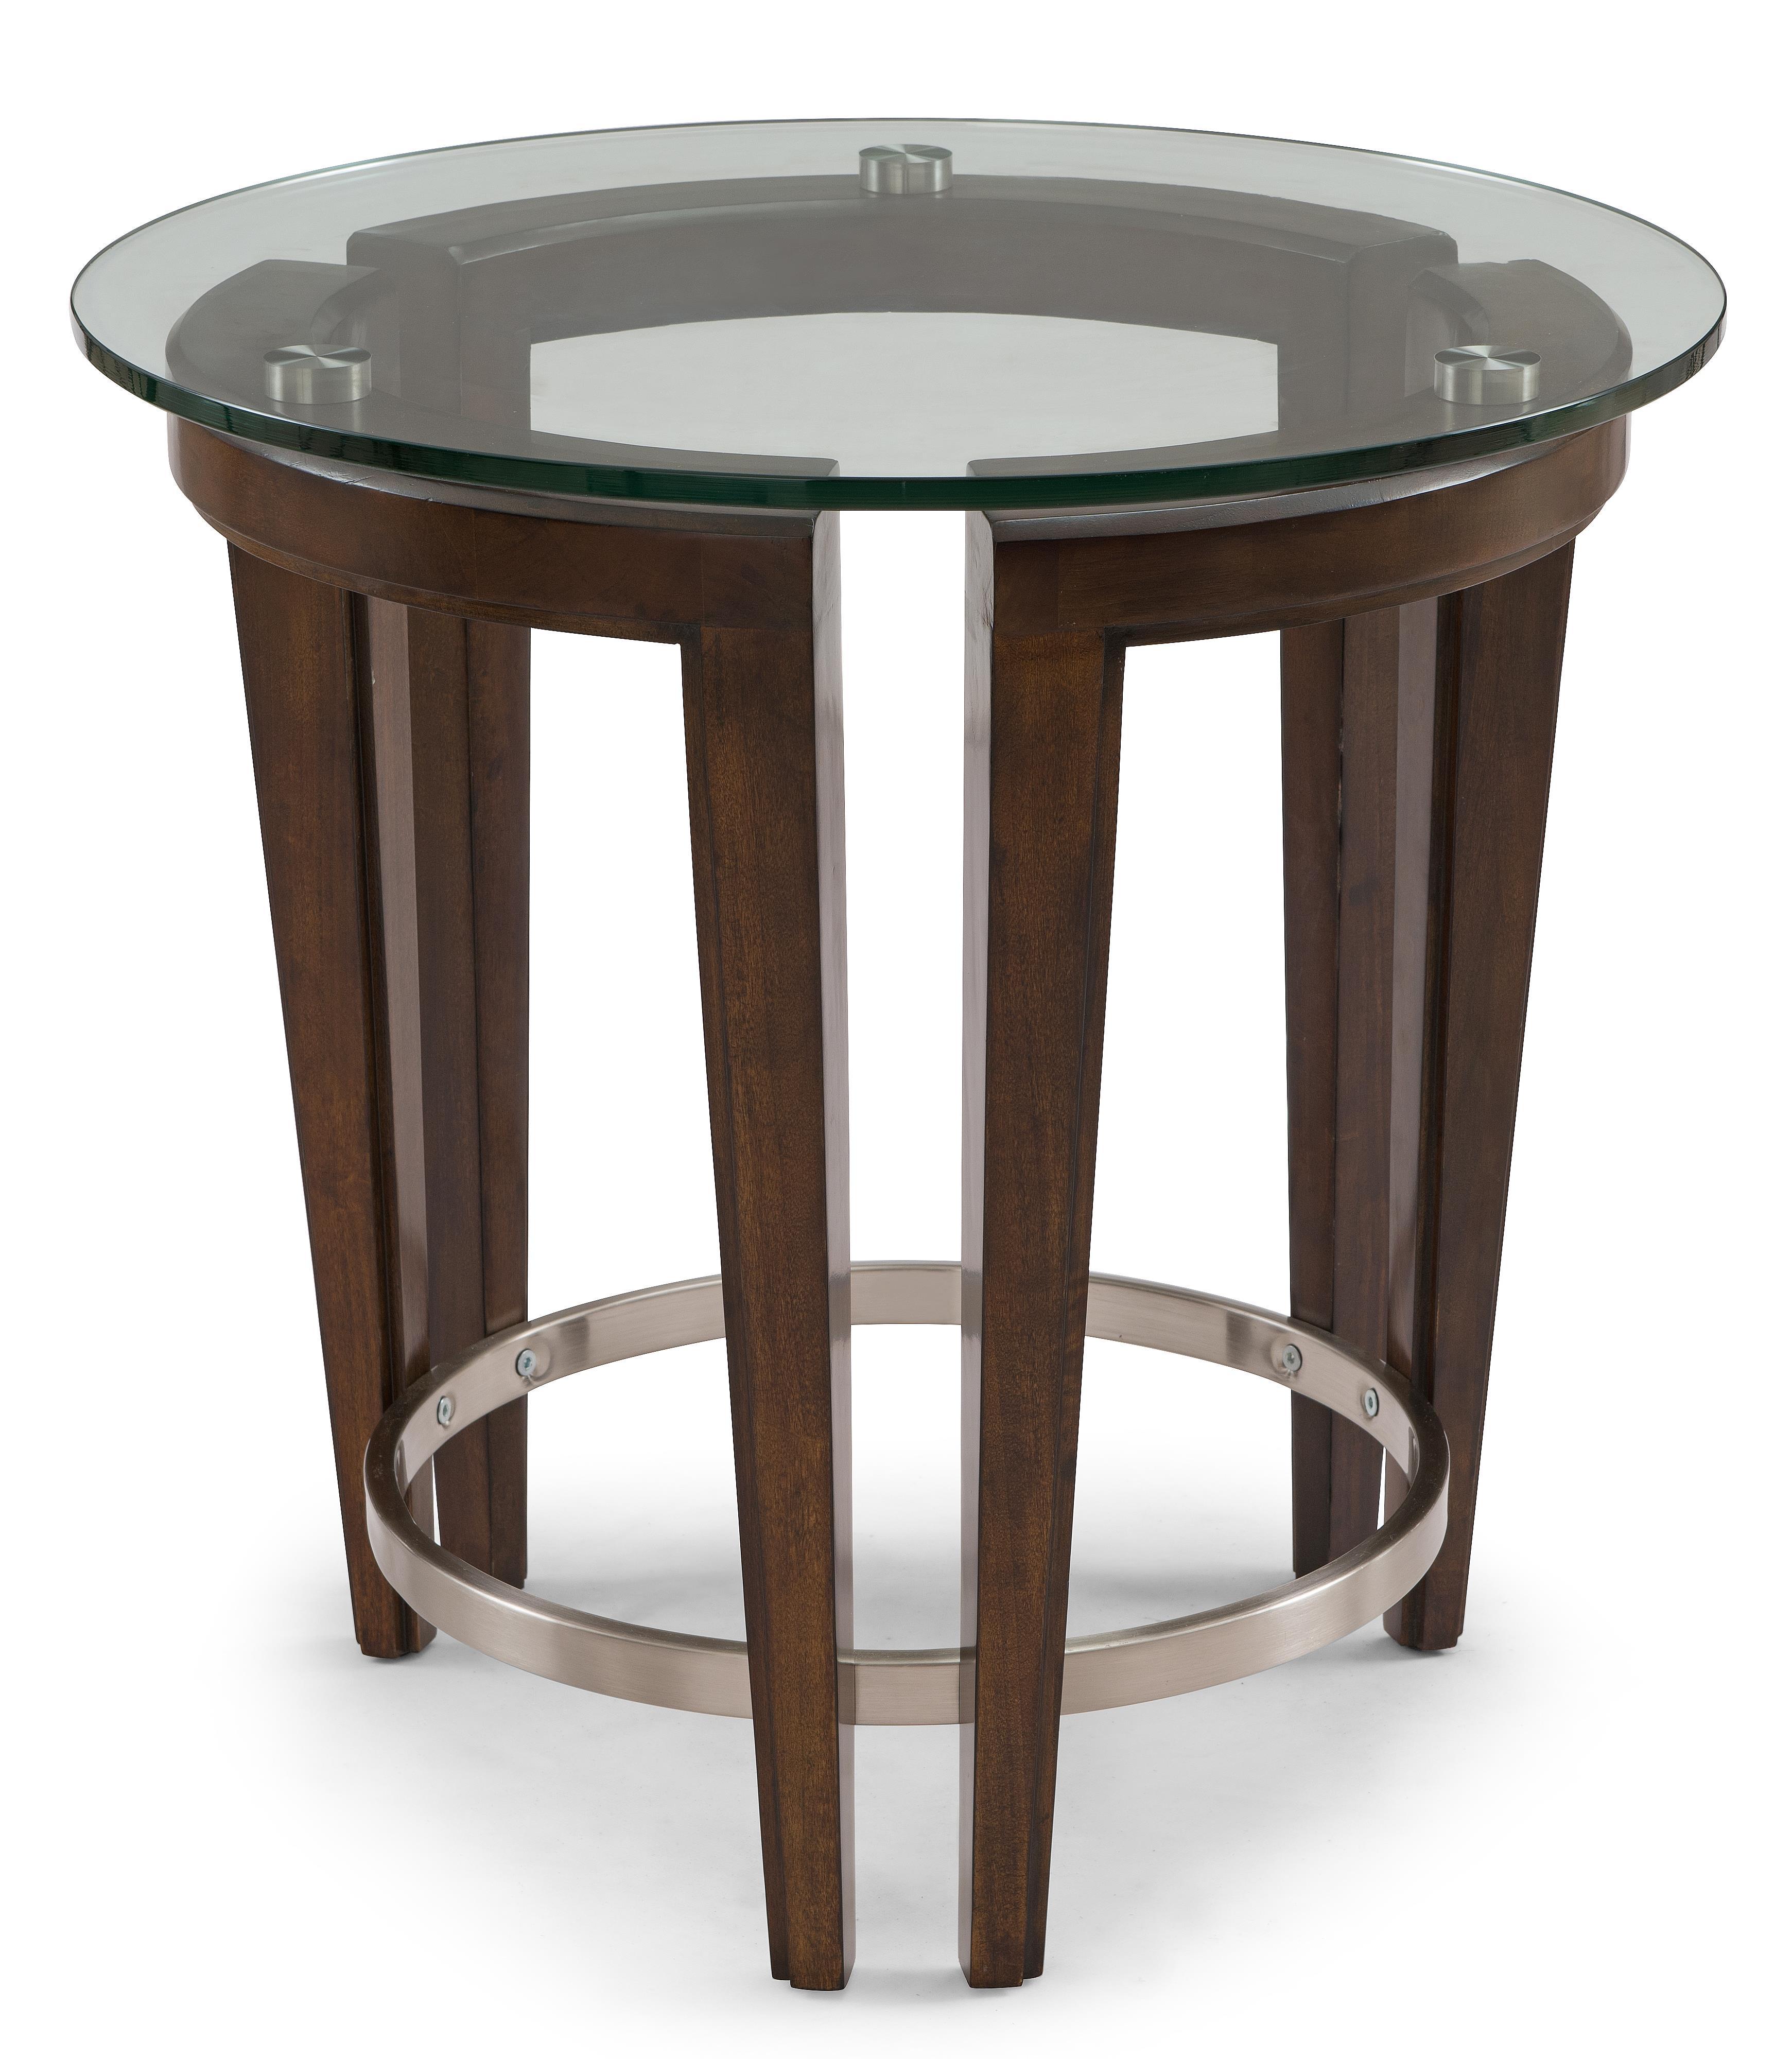 belfort select carmen contemporary wood and glass round end table belfort furniture end tables. Black Bedroom Furniture Sets. Home Design Ideas